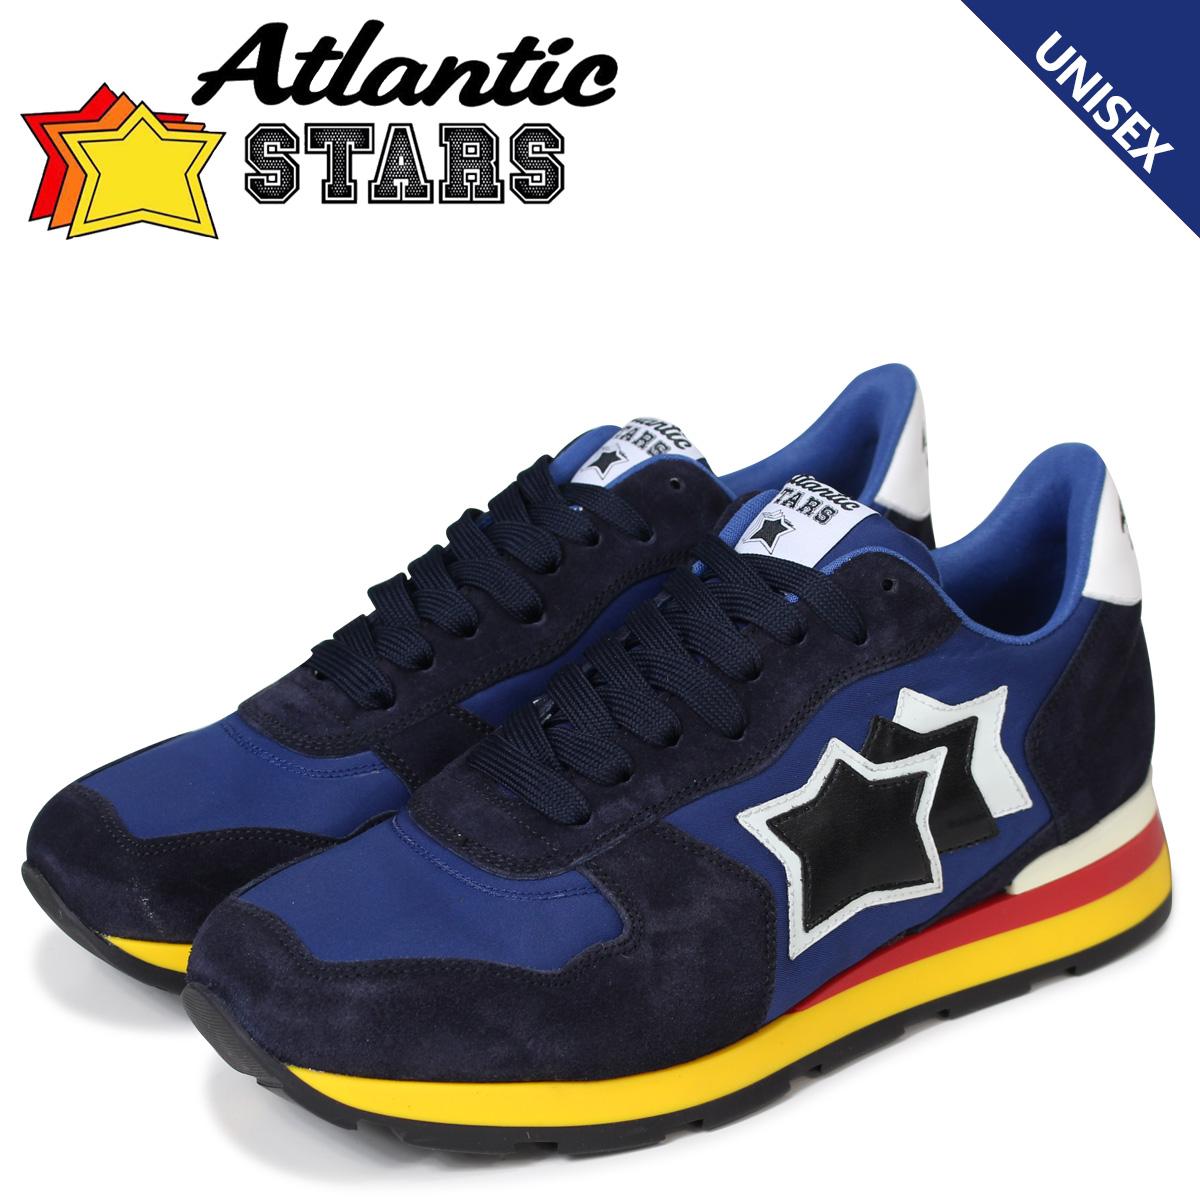 Atlantic STARS メンズ スニーカー アトランティックスターズ アンタレス ANTARES AAB-89B ブルー